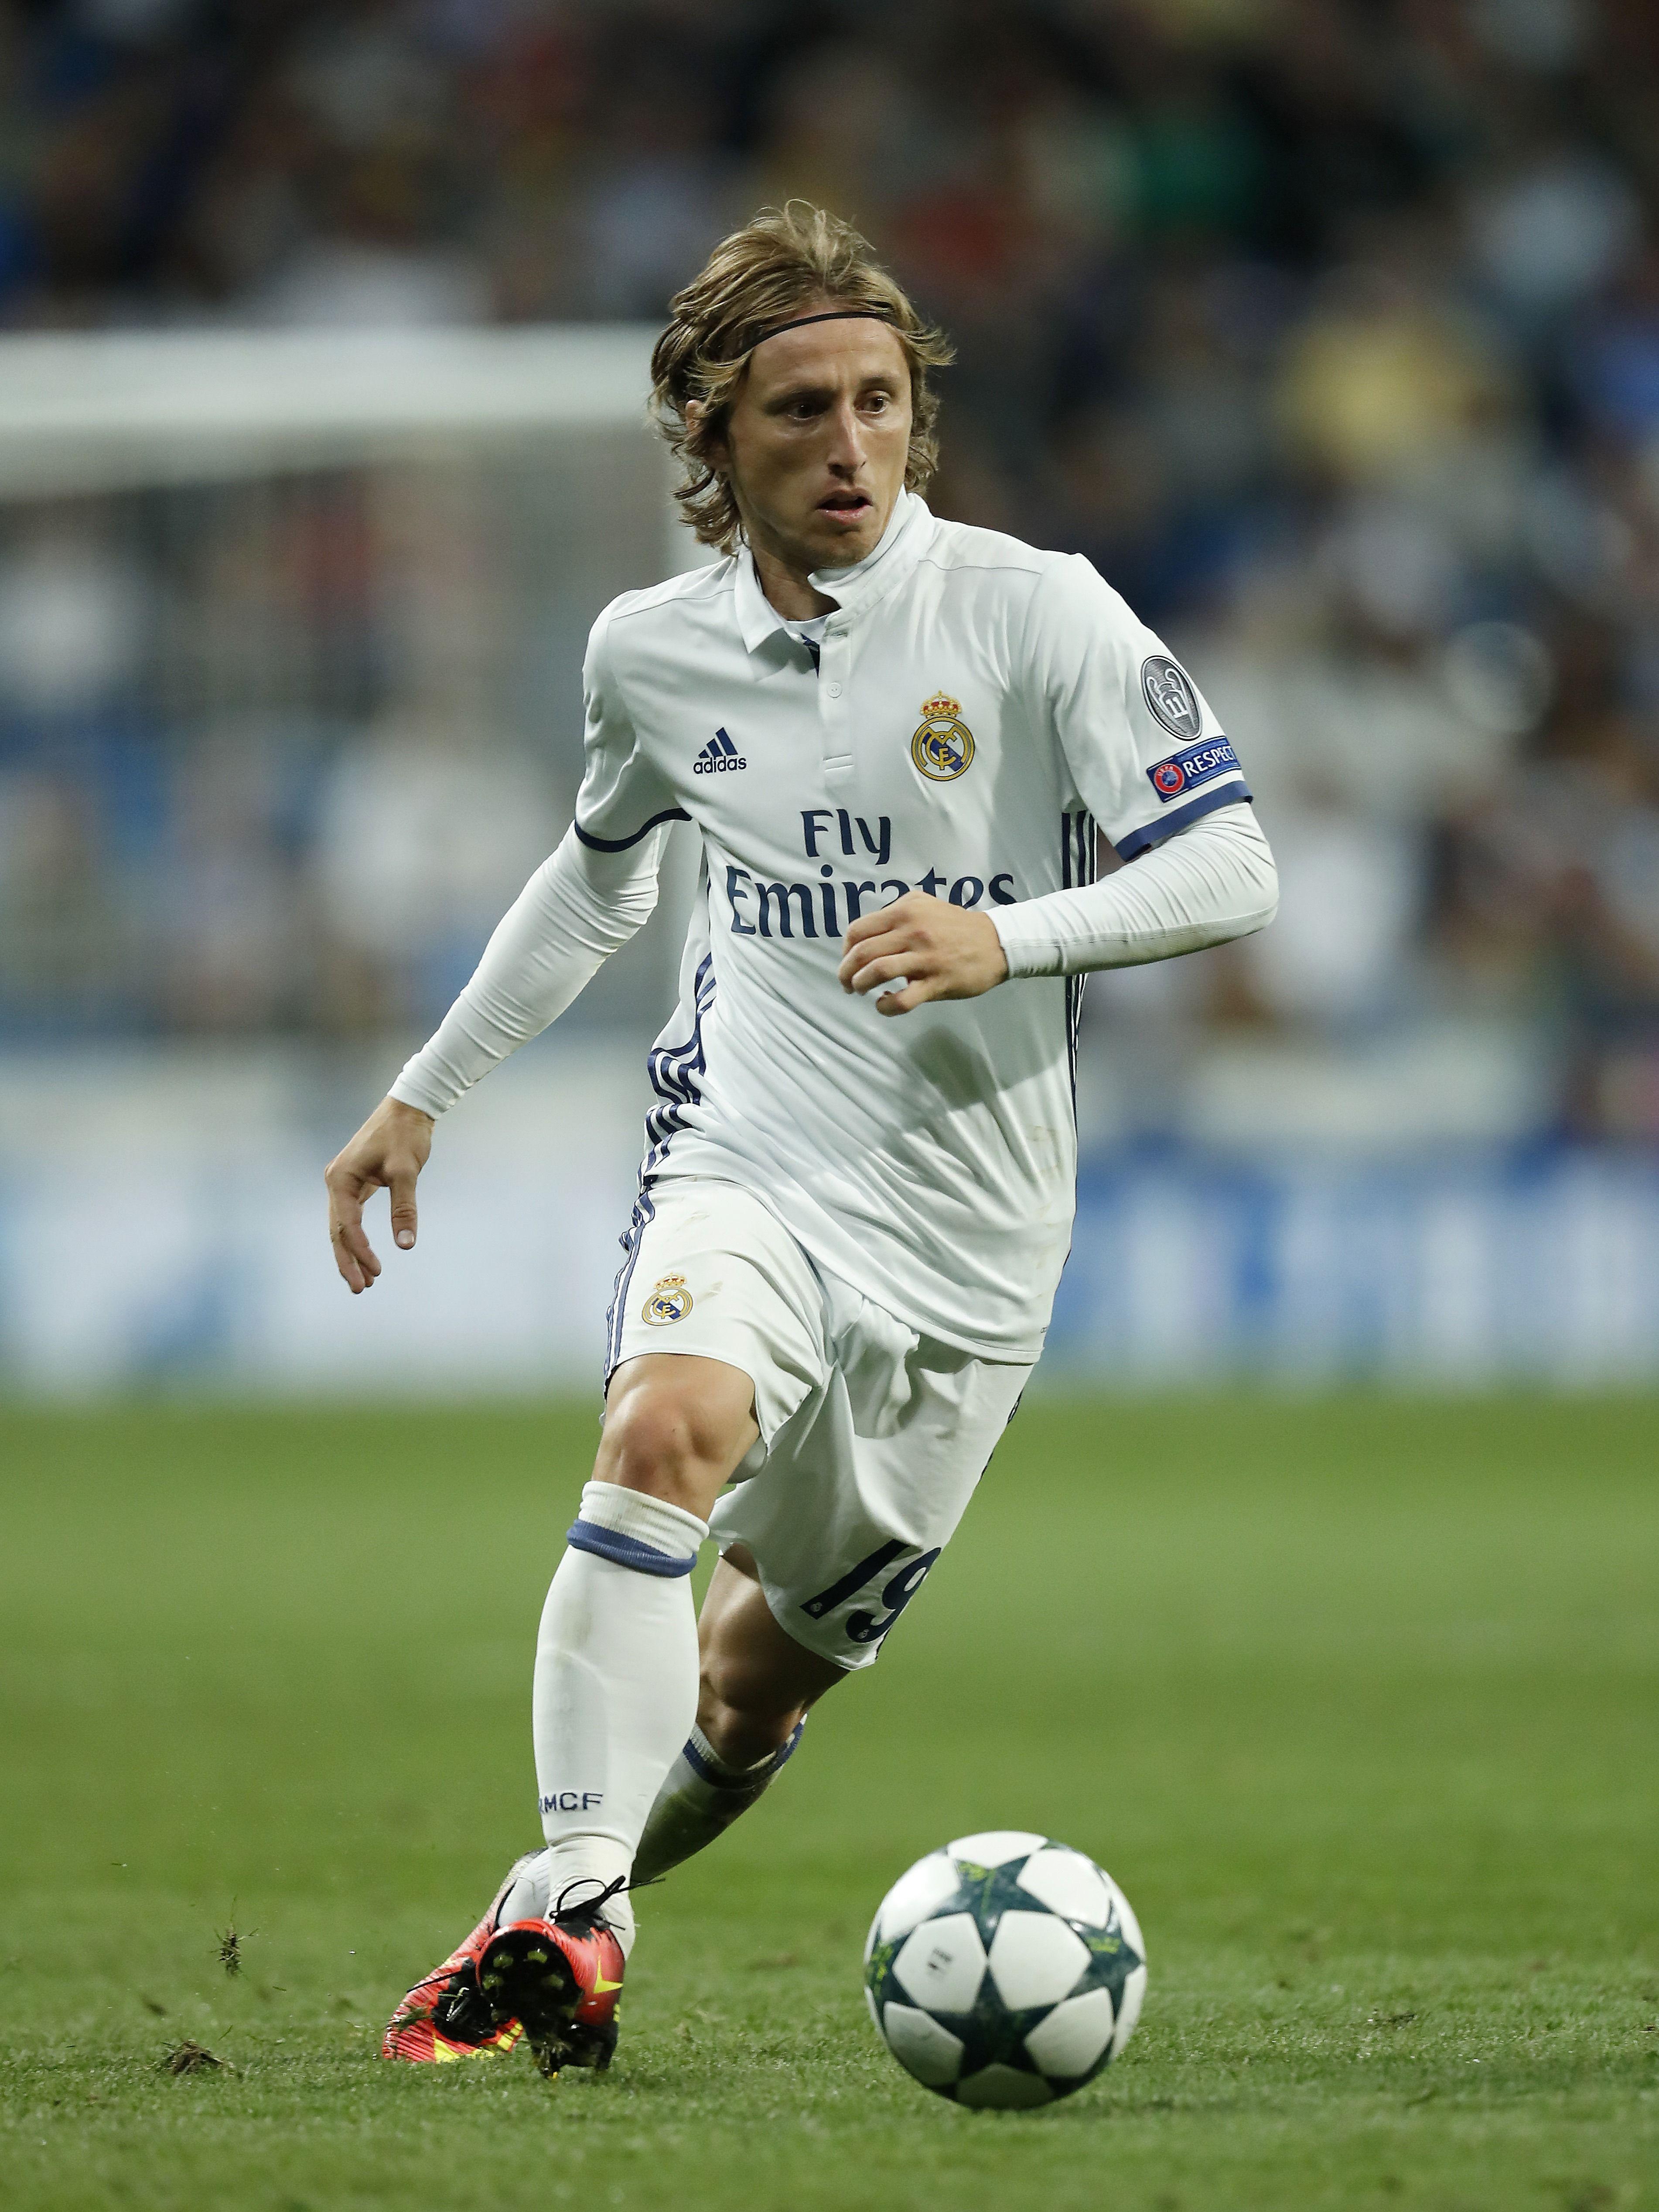 Luka Modric Signs Contract Extension Until 2020 Modric Pinterest